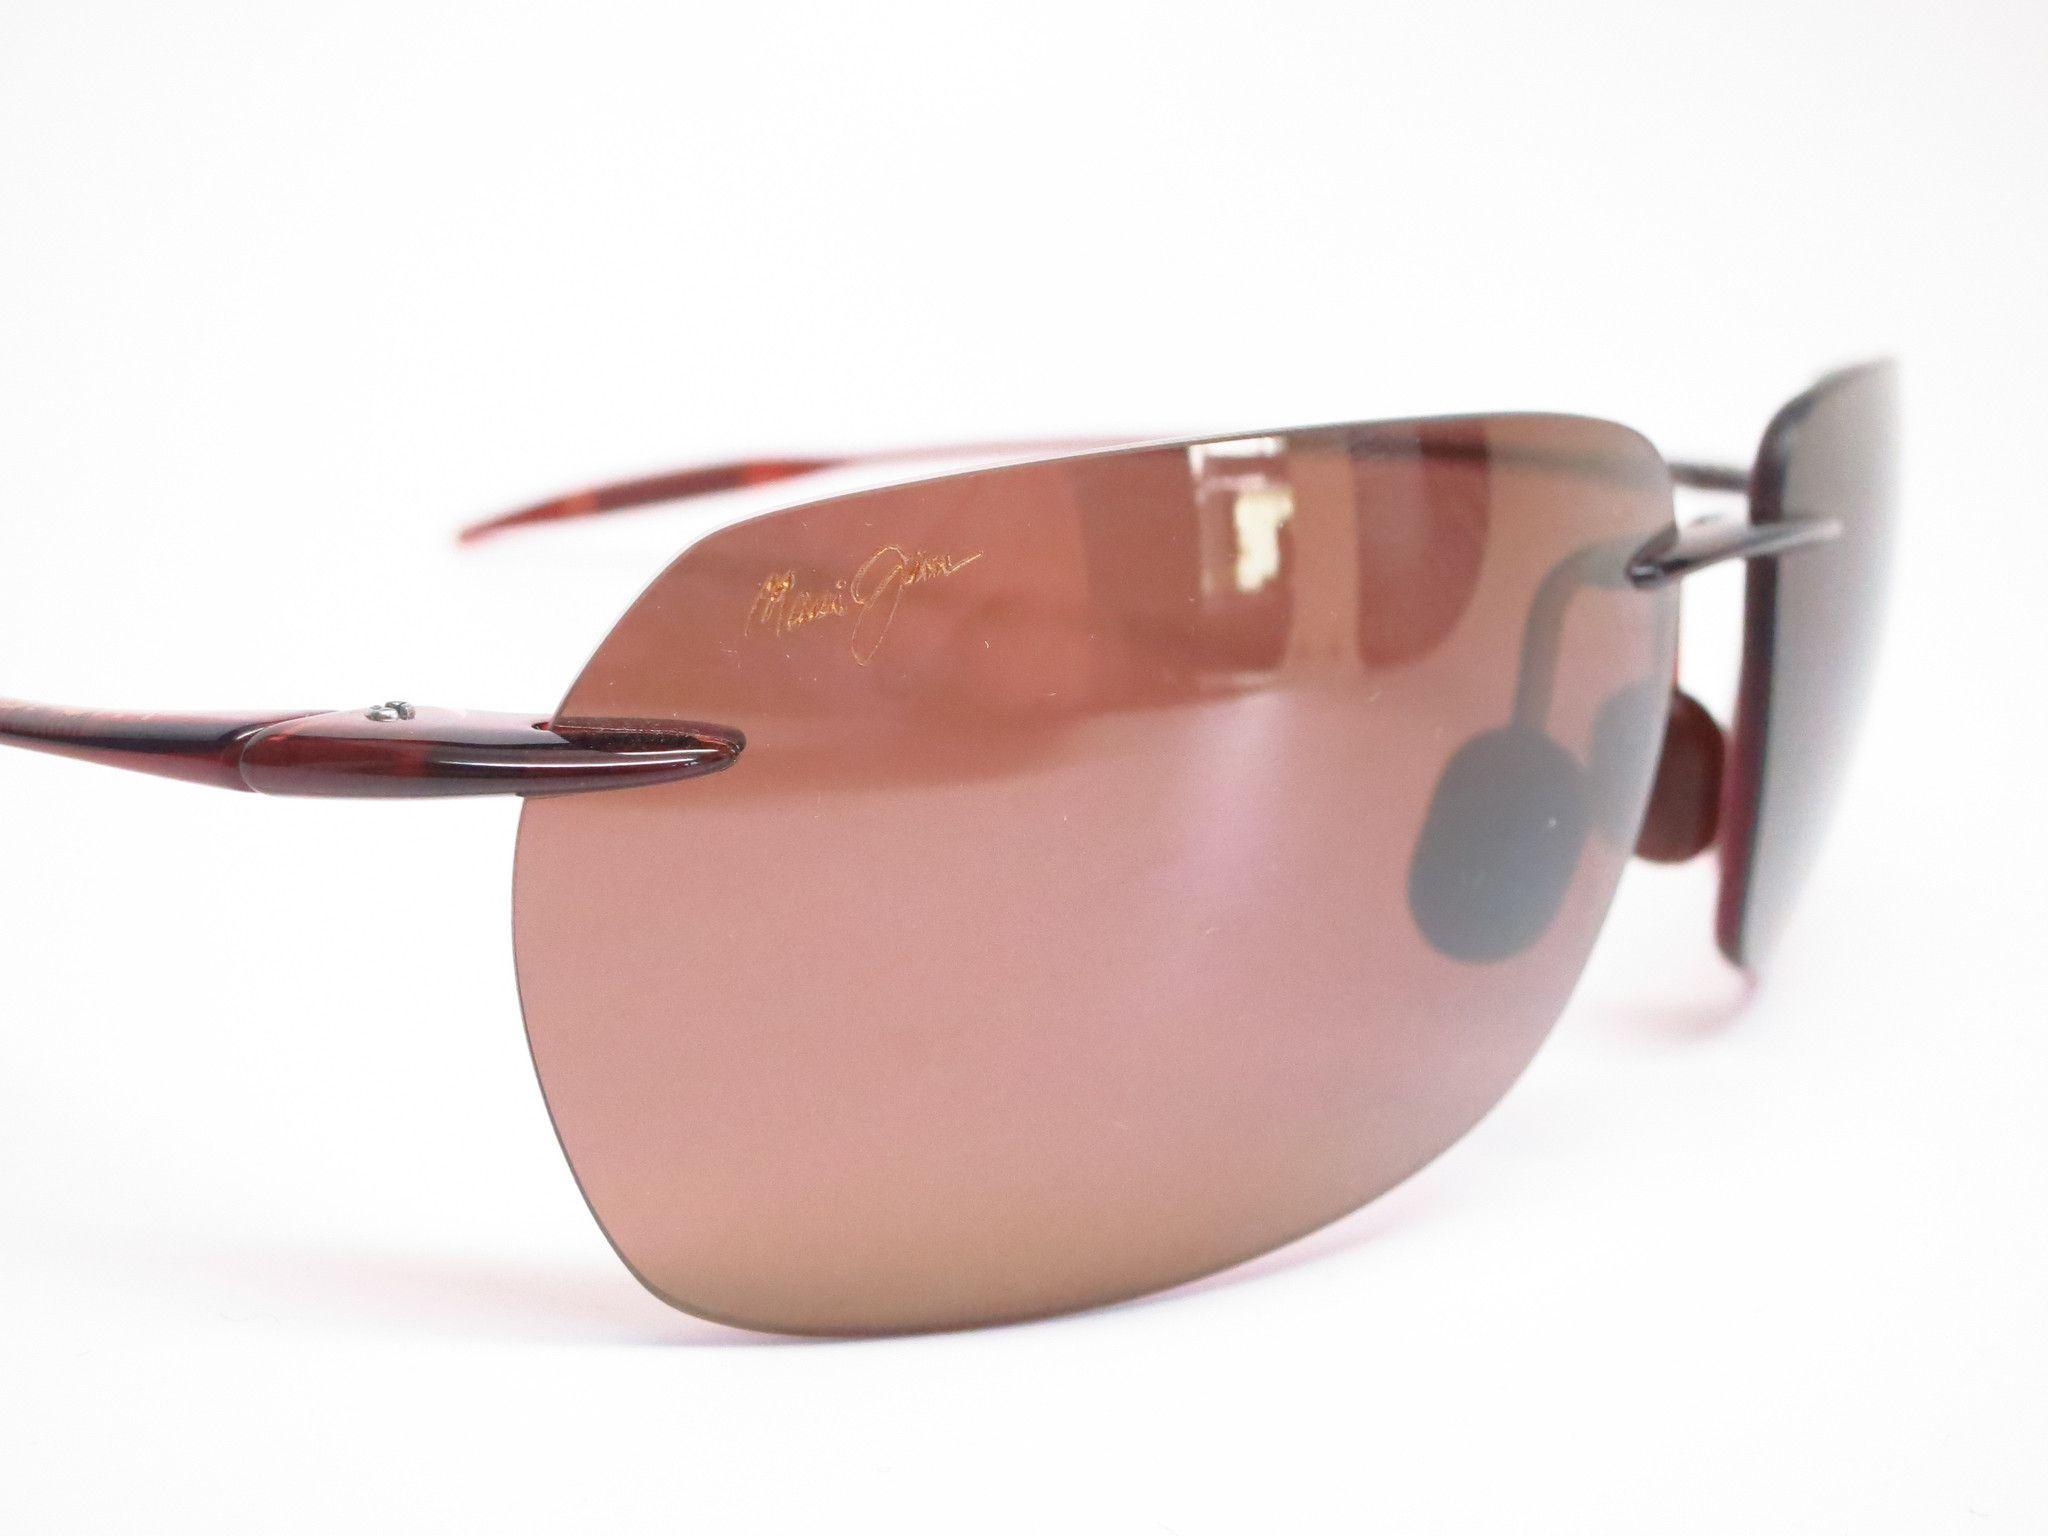 e7a15364848bc Product Details of Maui Jim Banzai Sunglasses Brand   Maui Jim Model Name    Banzai Model